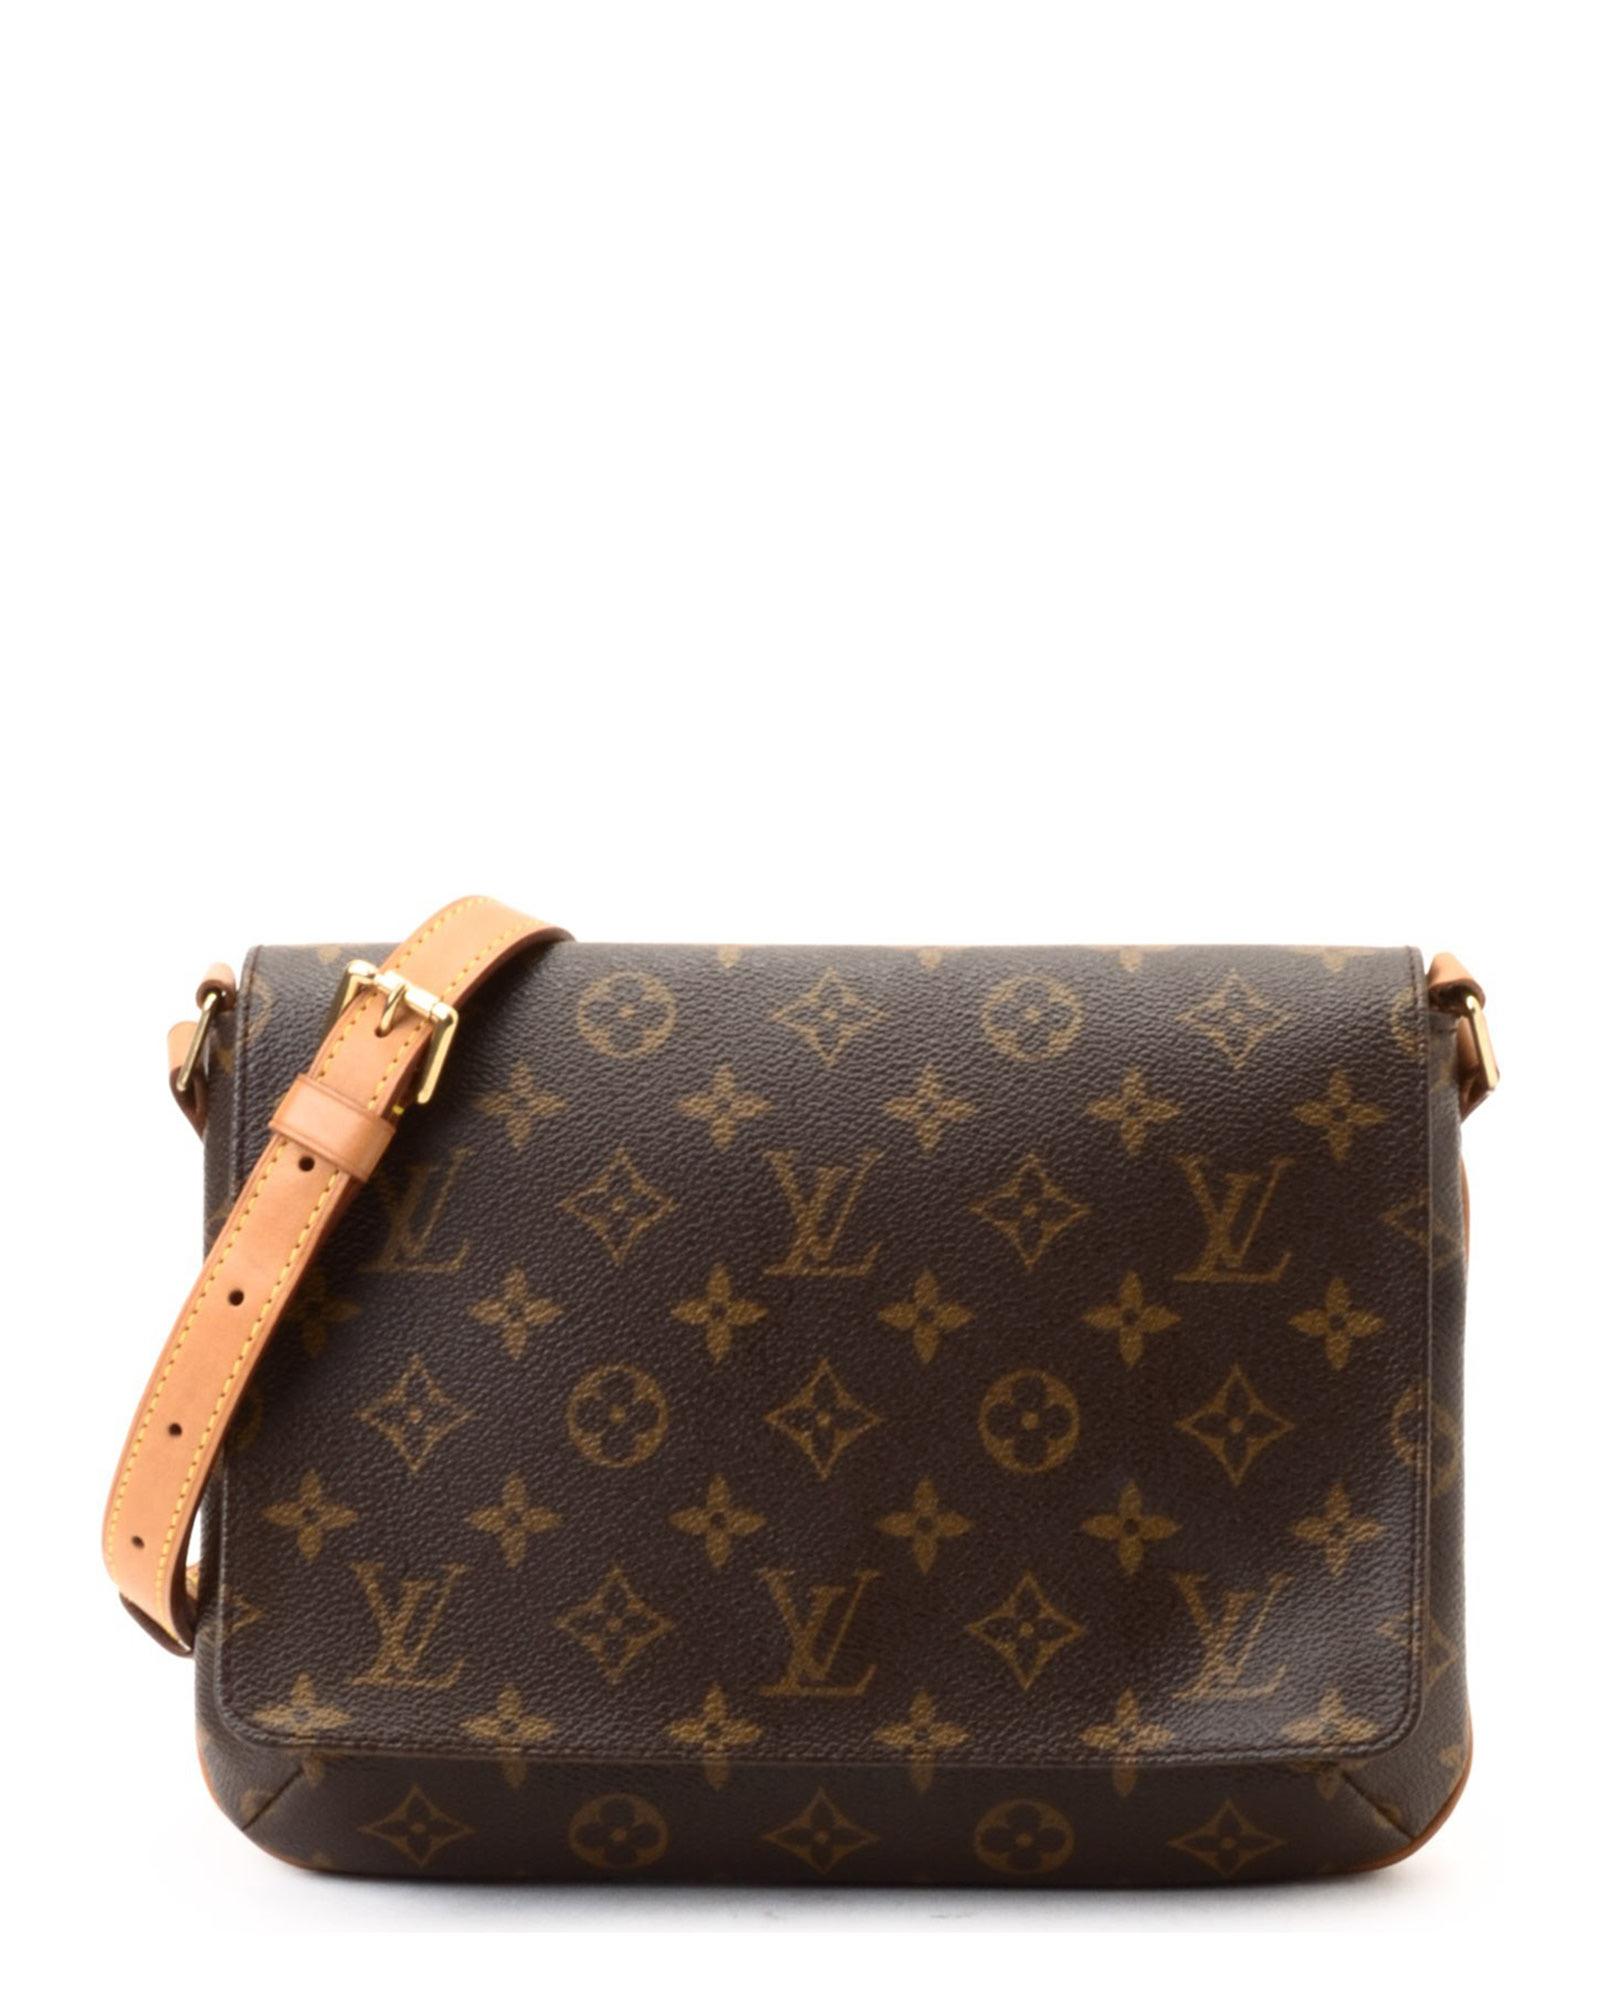 70c44a37f4 Century 21 Handbags - Foto Handbag All Collections Salonagafiya.Com